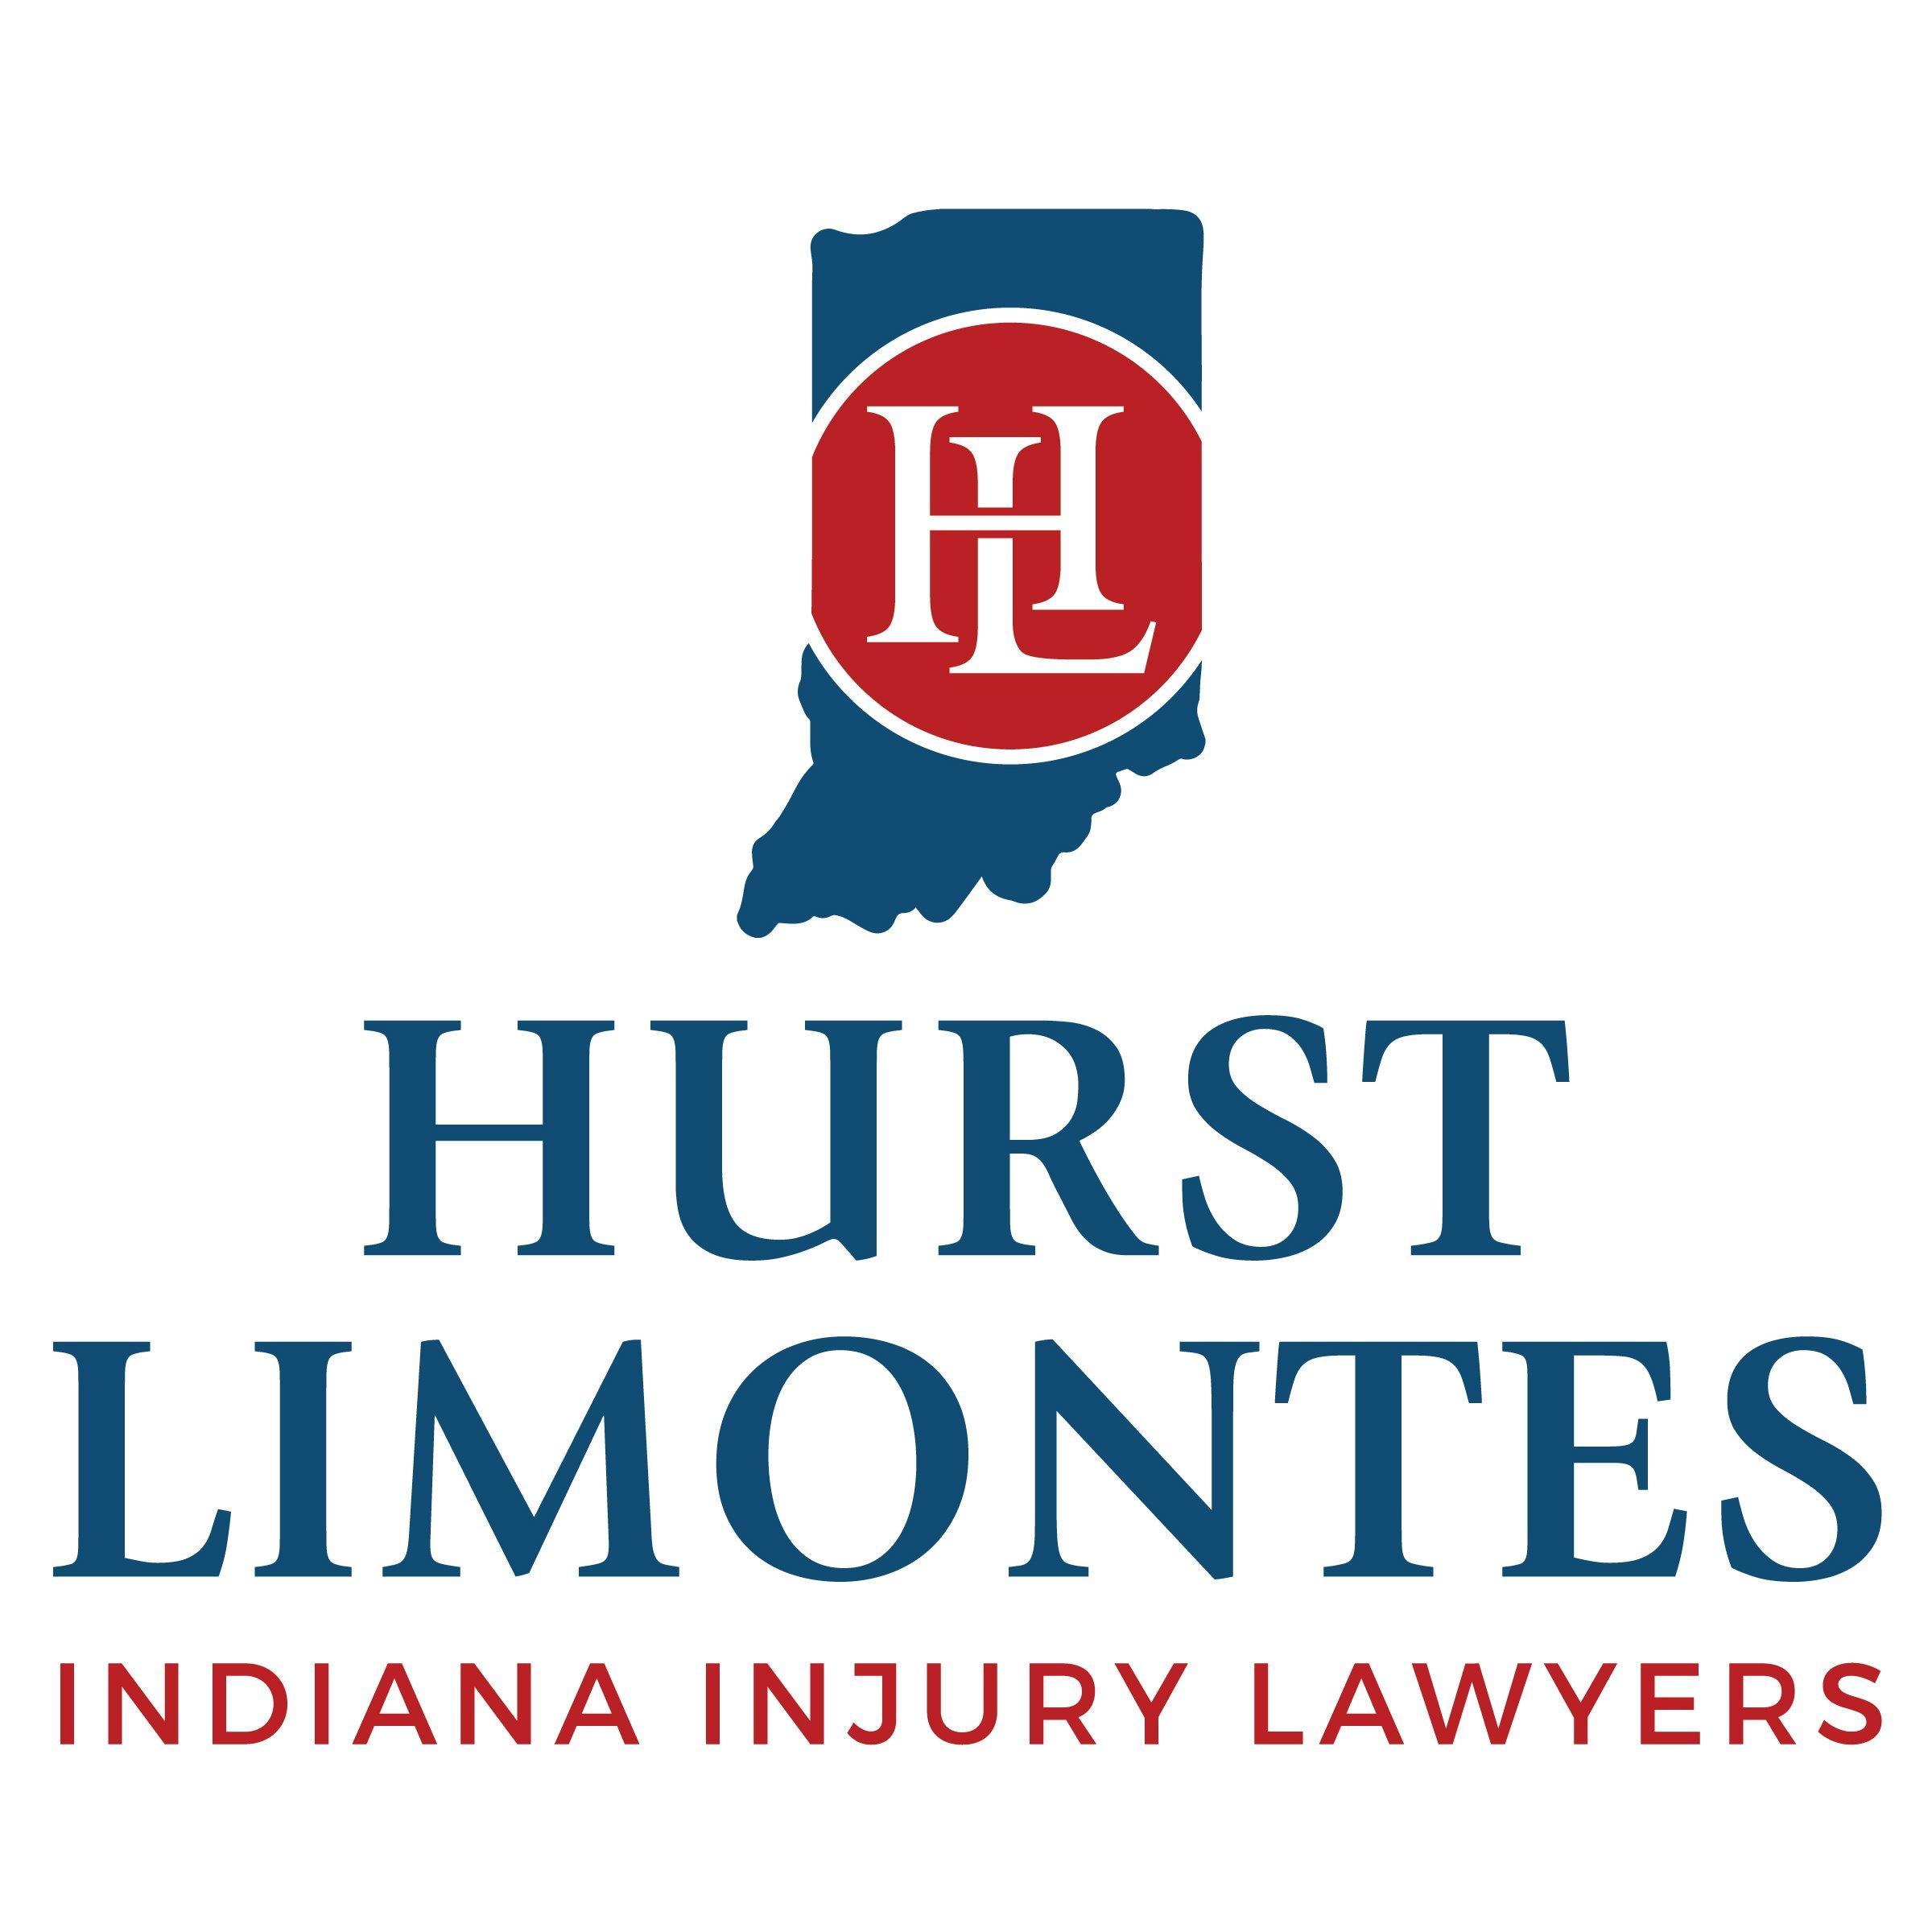 Hurst Limontes LLC